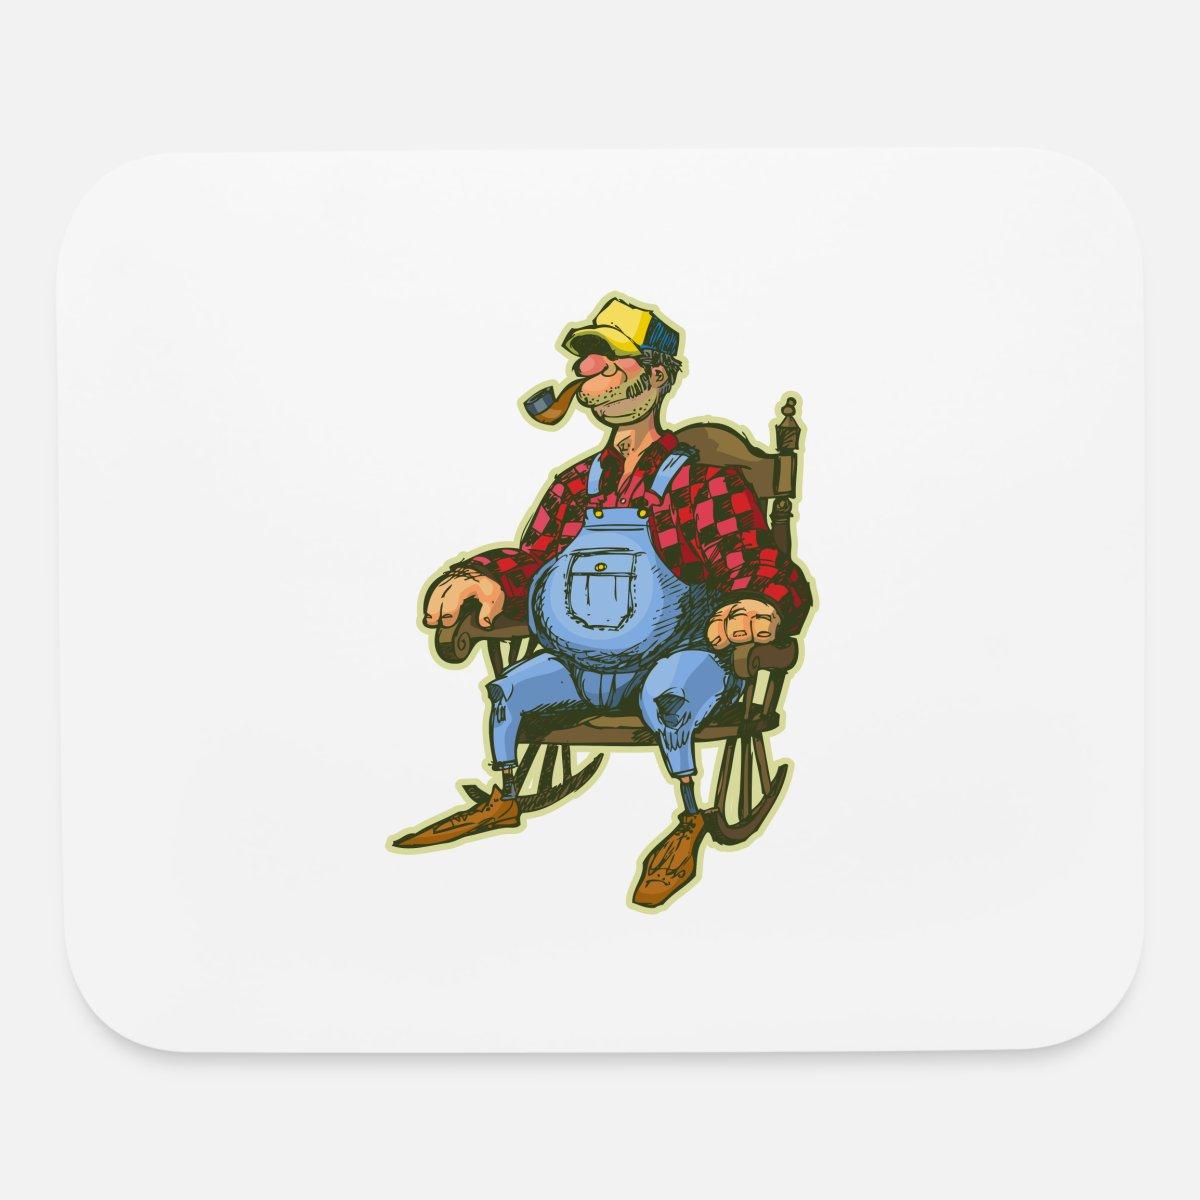 Rocking Chair Funny Cartoon Design Mouse Pad Horizontal White